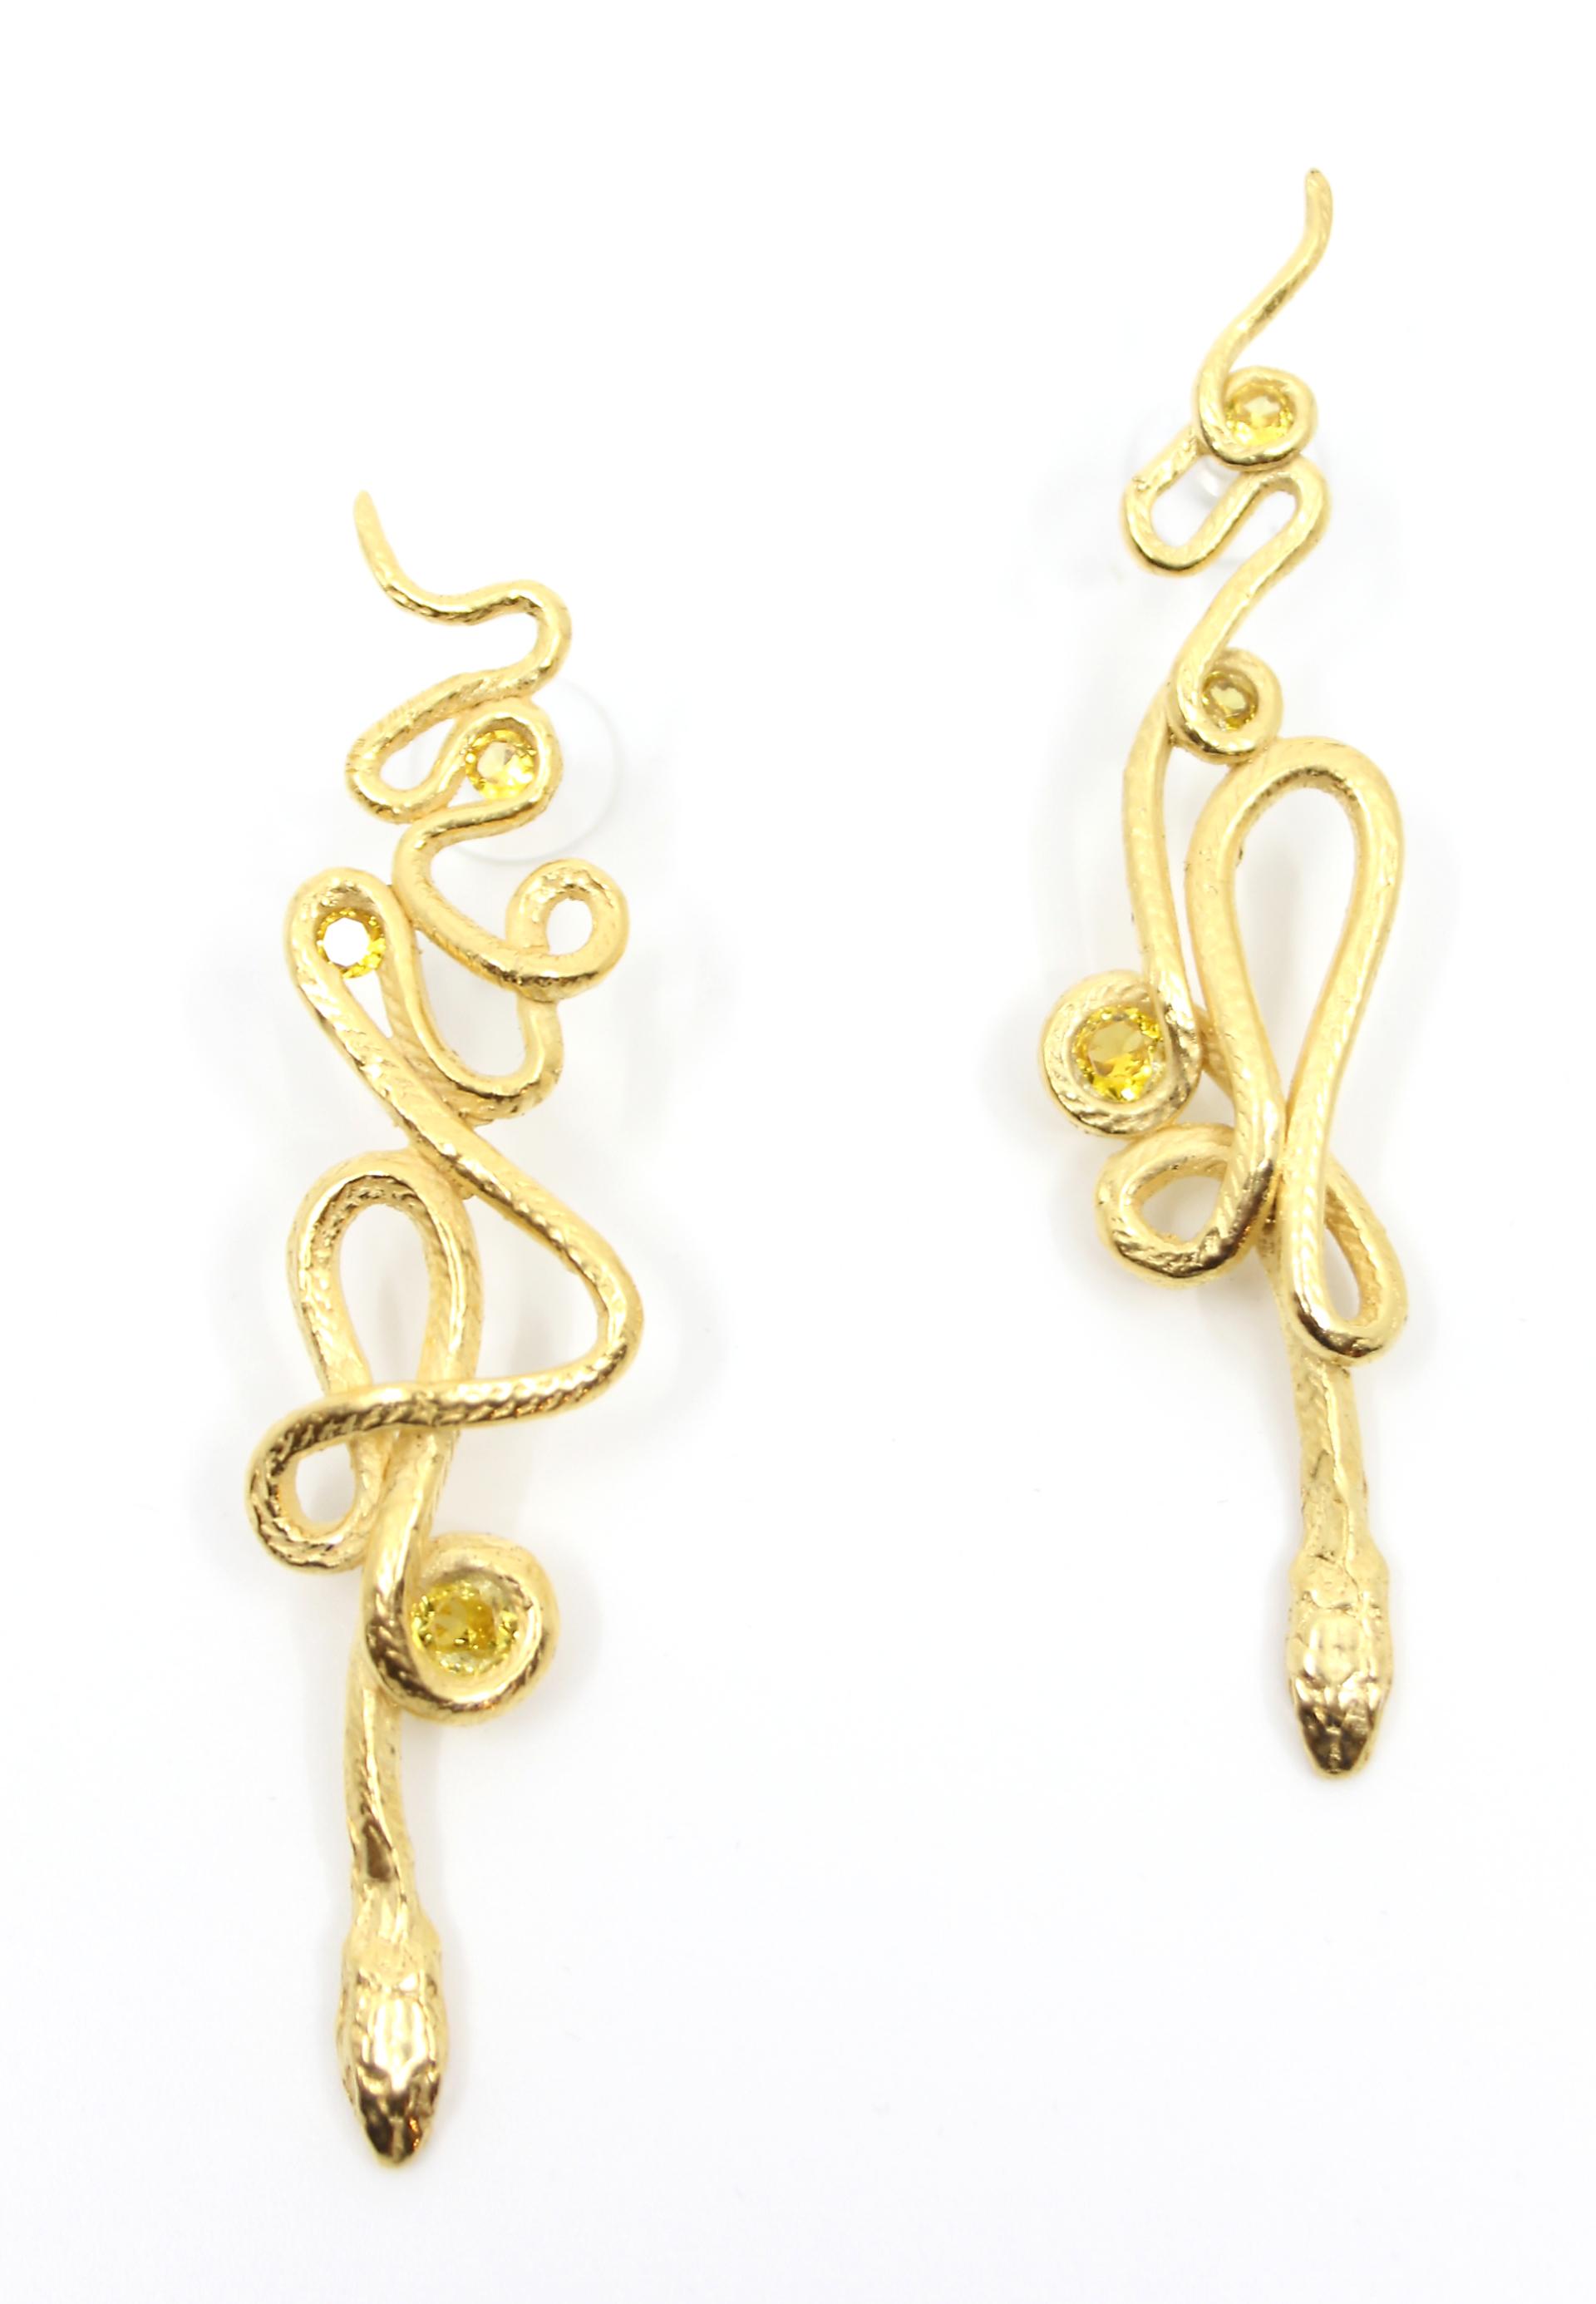 Gold Topaz Serpentine Earrings by Anna Johnson